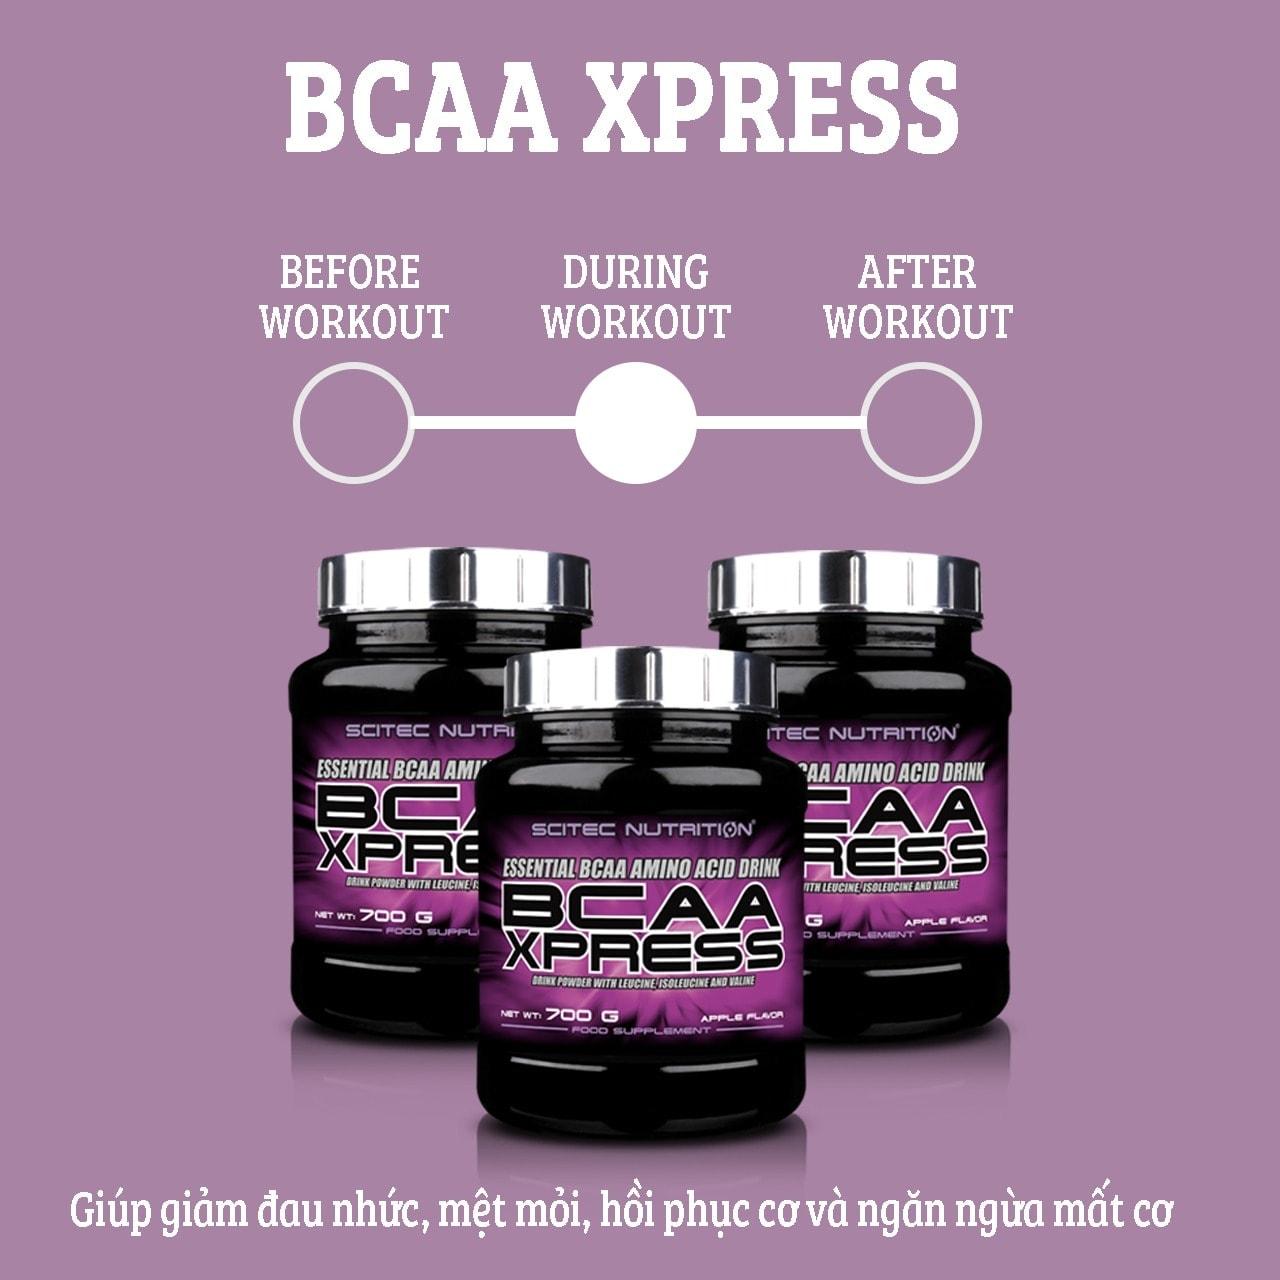 Scitec Nutrition - BCAA Xpress (100 lần dùng) - 90061556 3084926958208330 700999